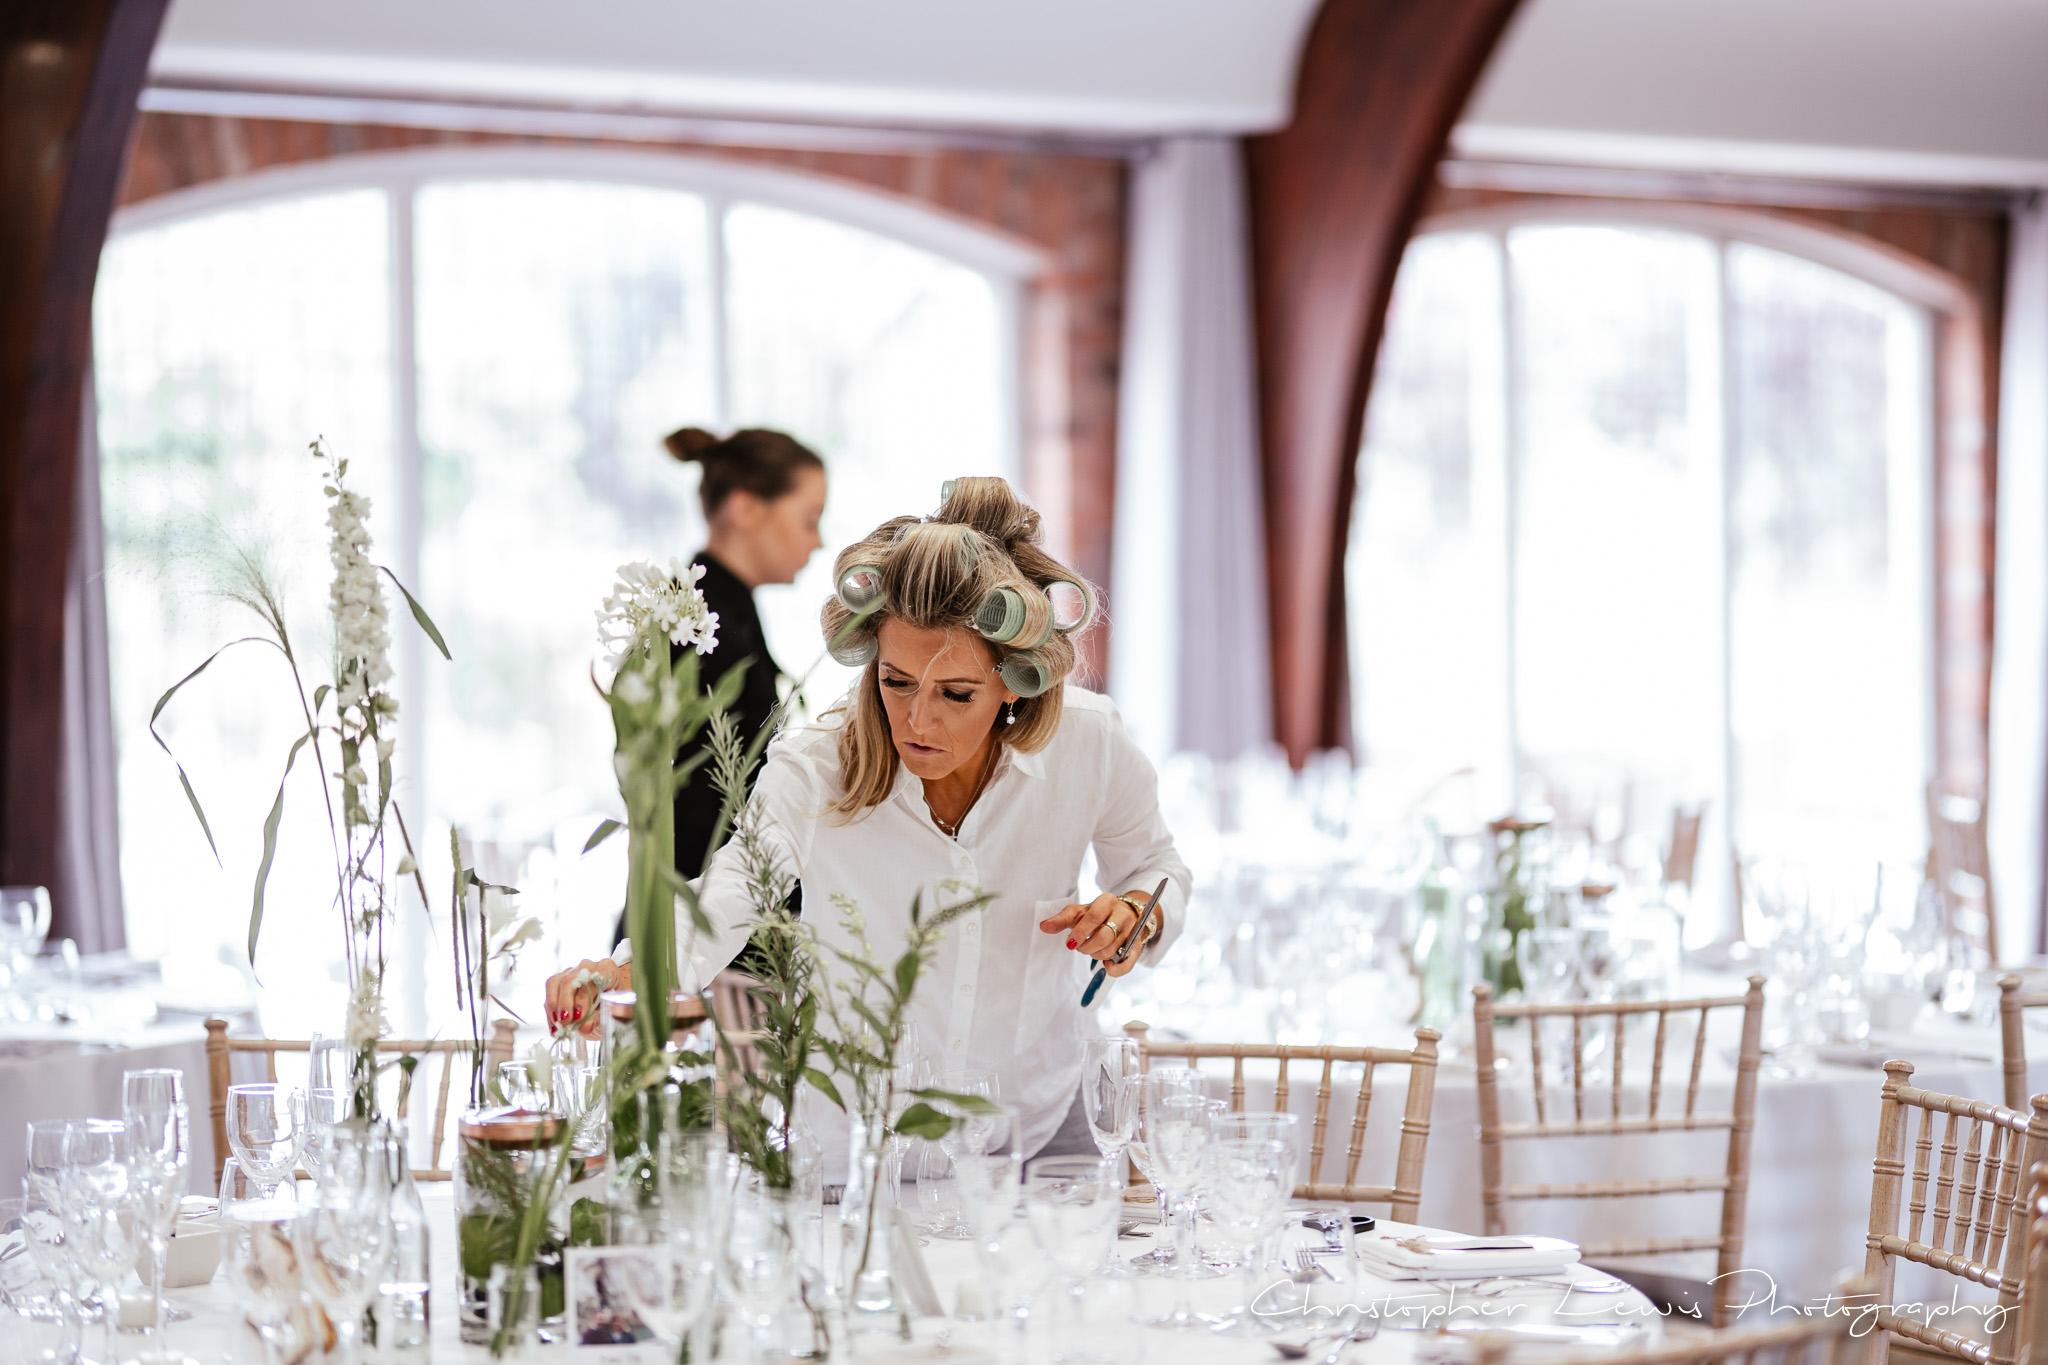 Colshaw Hall Wedding flowers